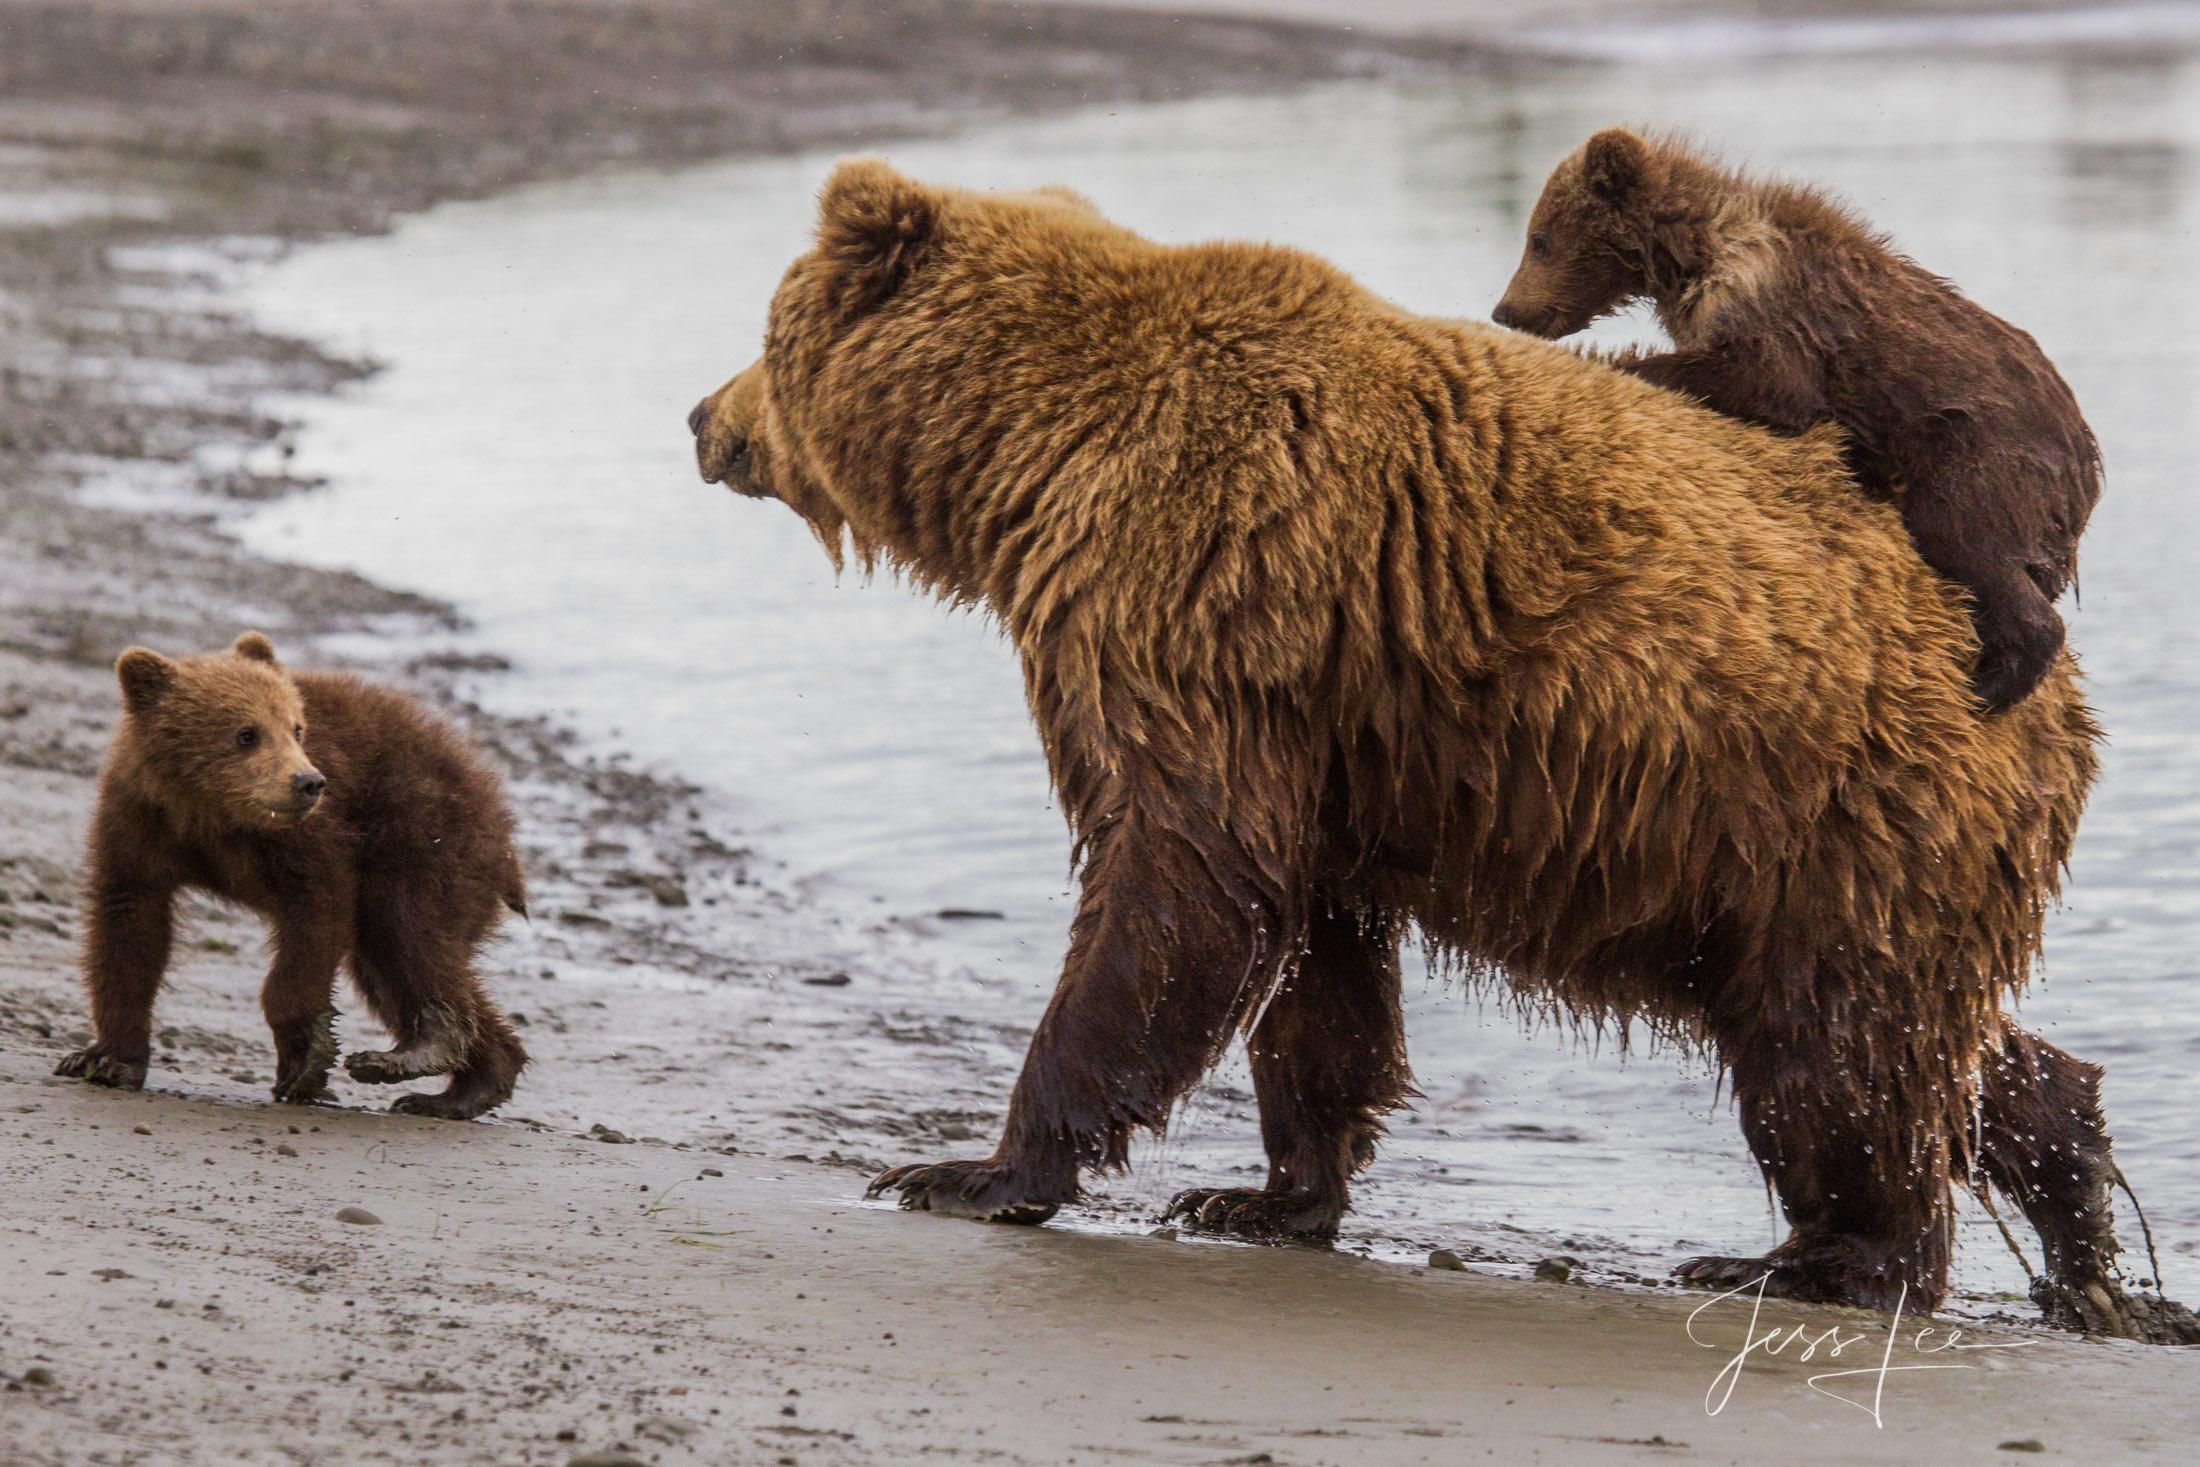 Grizzly, alaska, bear, brown, brown bear, coastal, lake clark, national park, Alaska*, bear*, brown bear*, brown bears*, brown*, coastal*, cubs*, grizzlies*, Grizzly*, Jess Lee*, Cooke inlet, legendar, photo